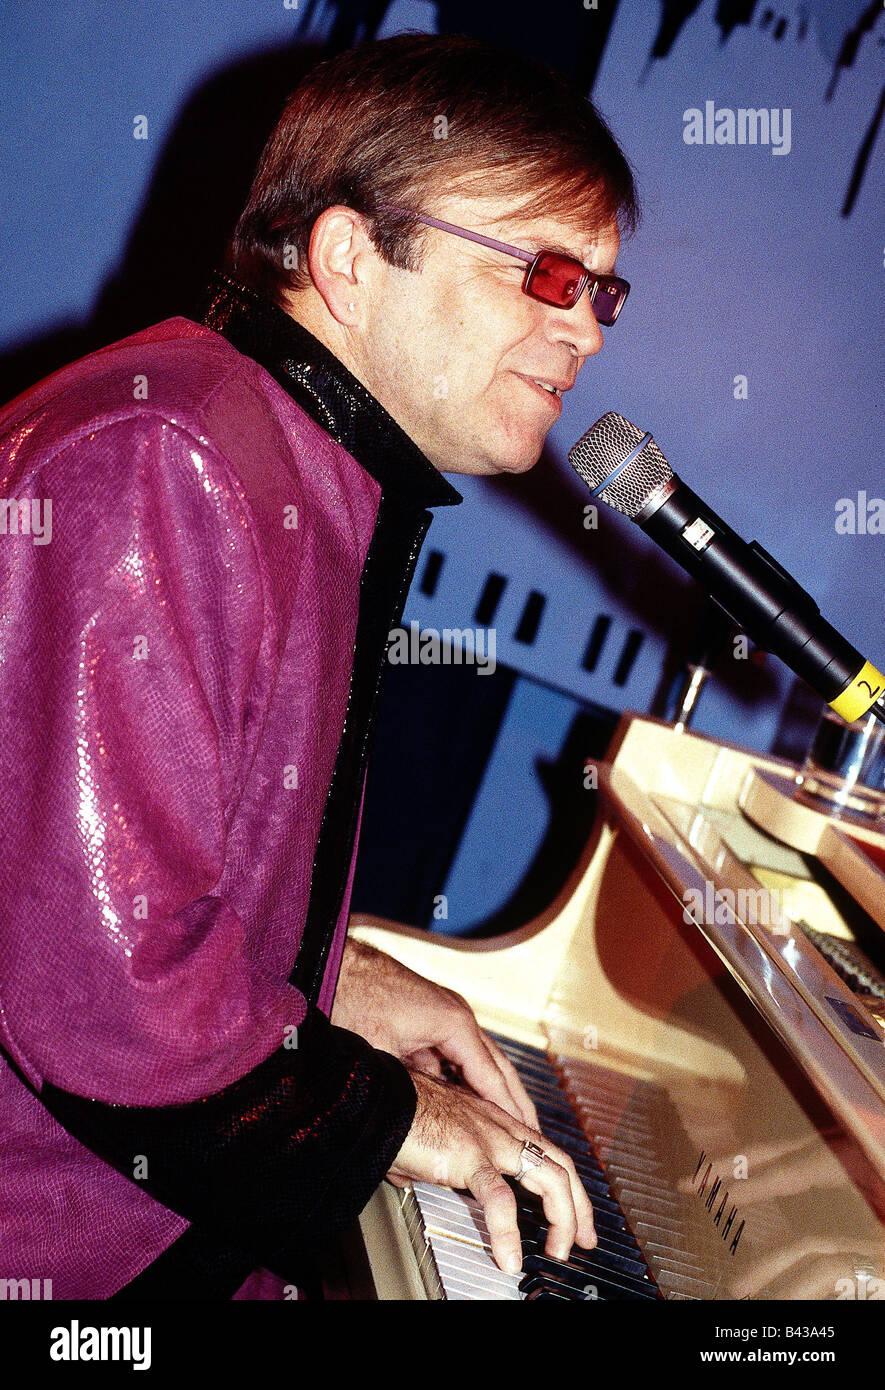 Adams, Mitch, singer, entertainer, look-alike, Elton John, half length, playing the piano, Munich, 13.11.2000, Additional - Stock Image